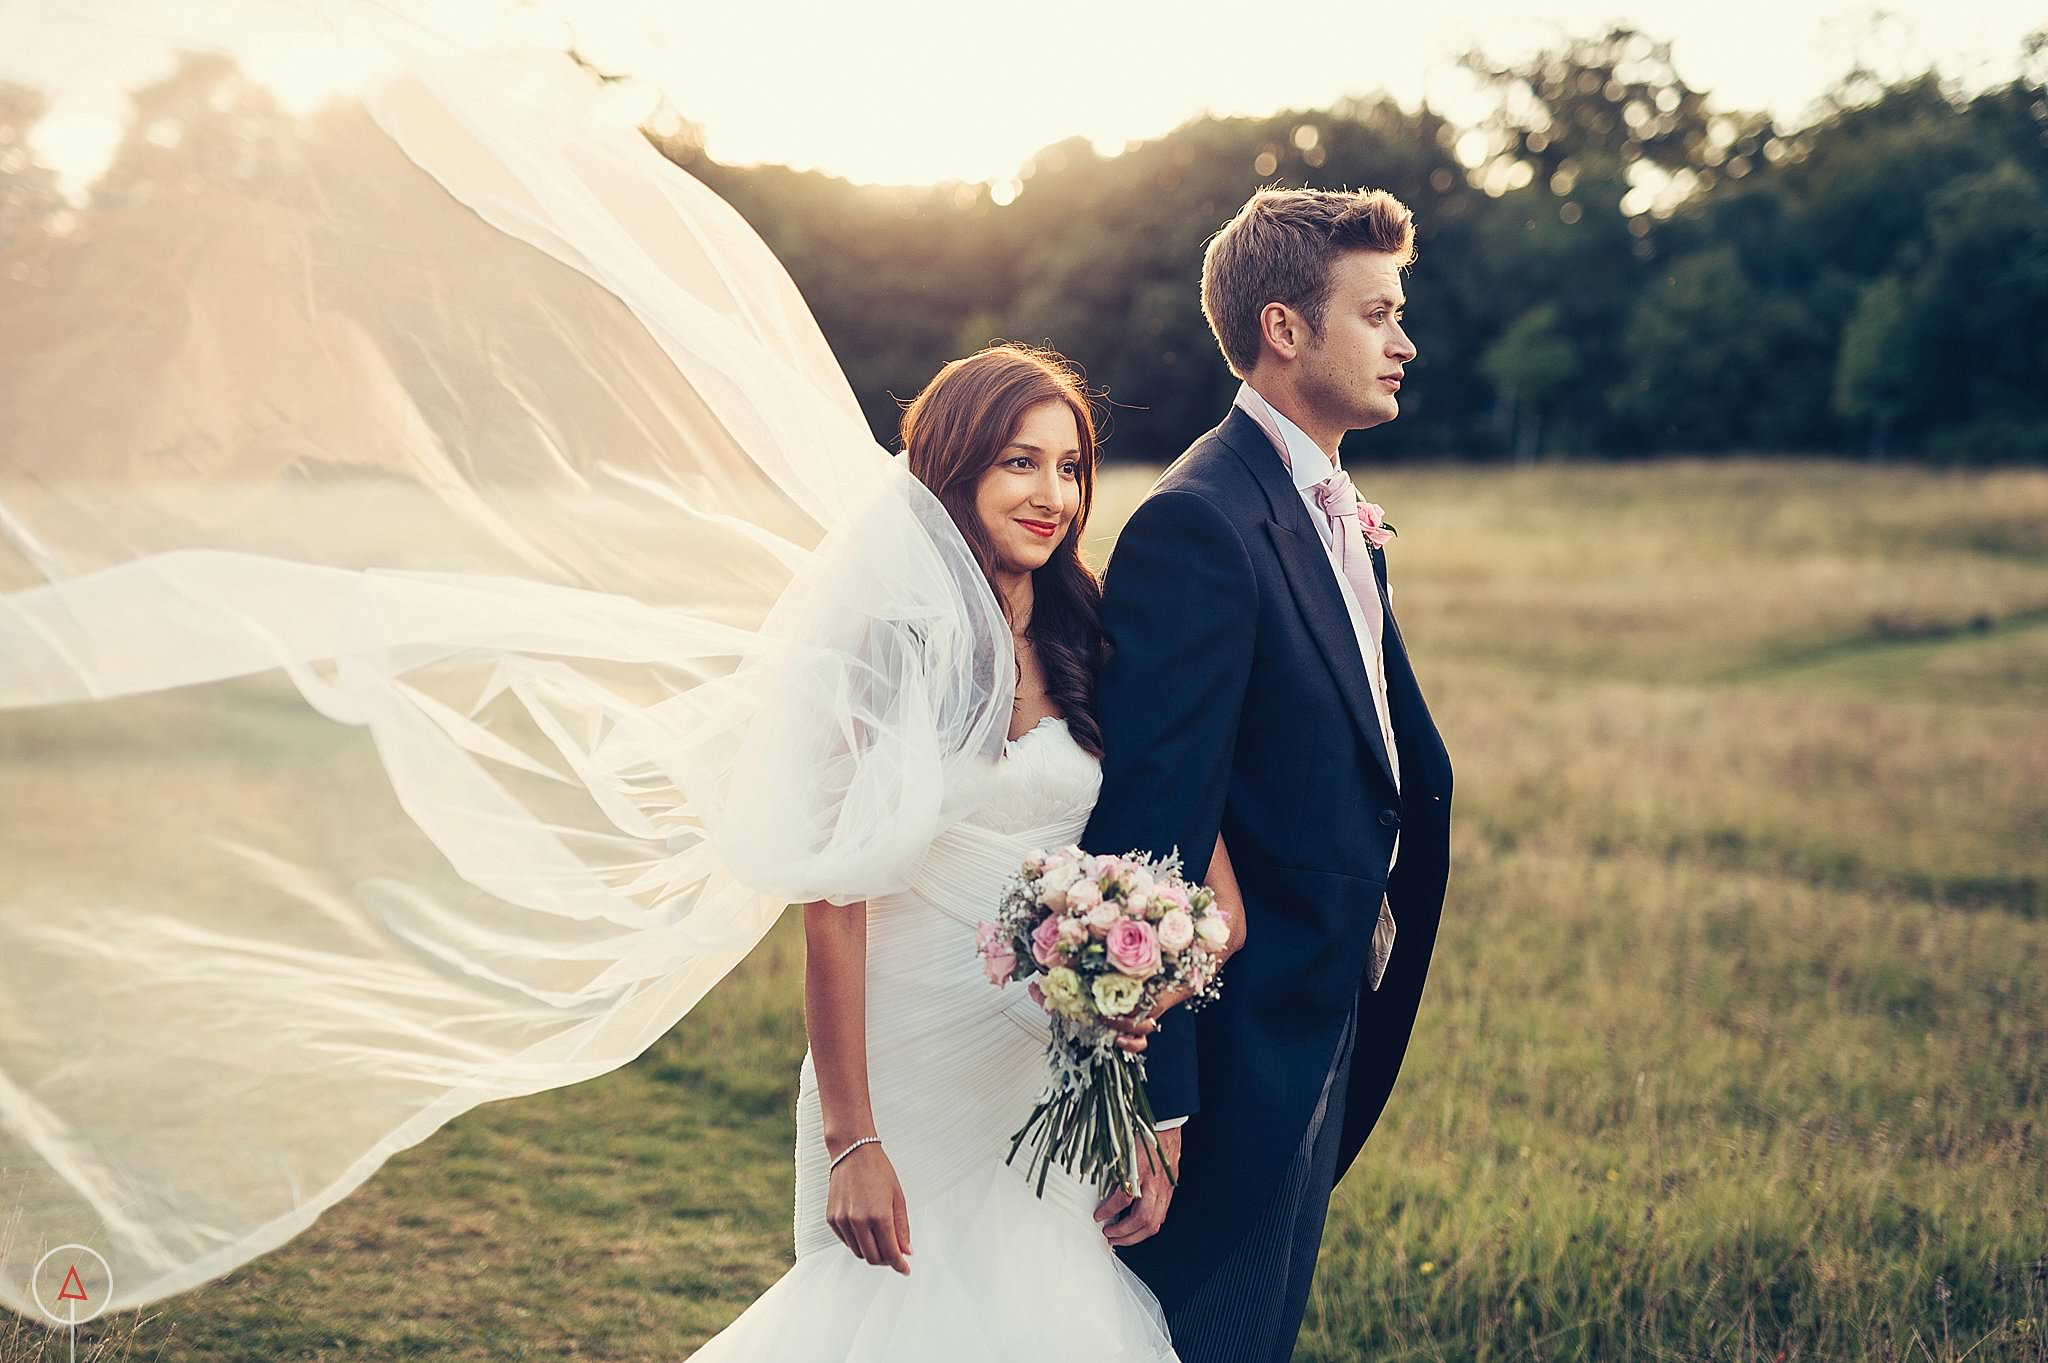 compton-verney-wedding-photographer-birmingham_1095